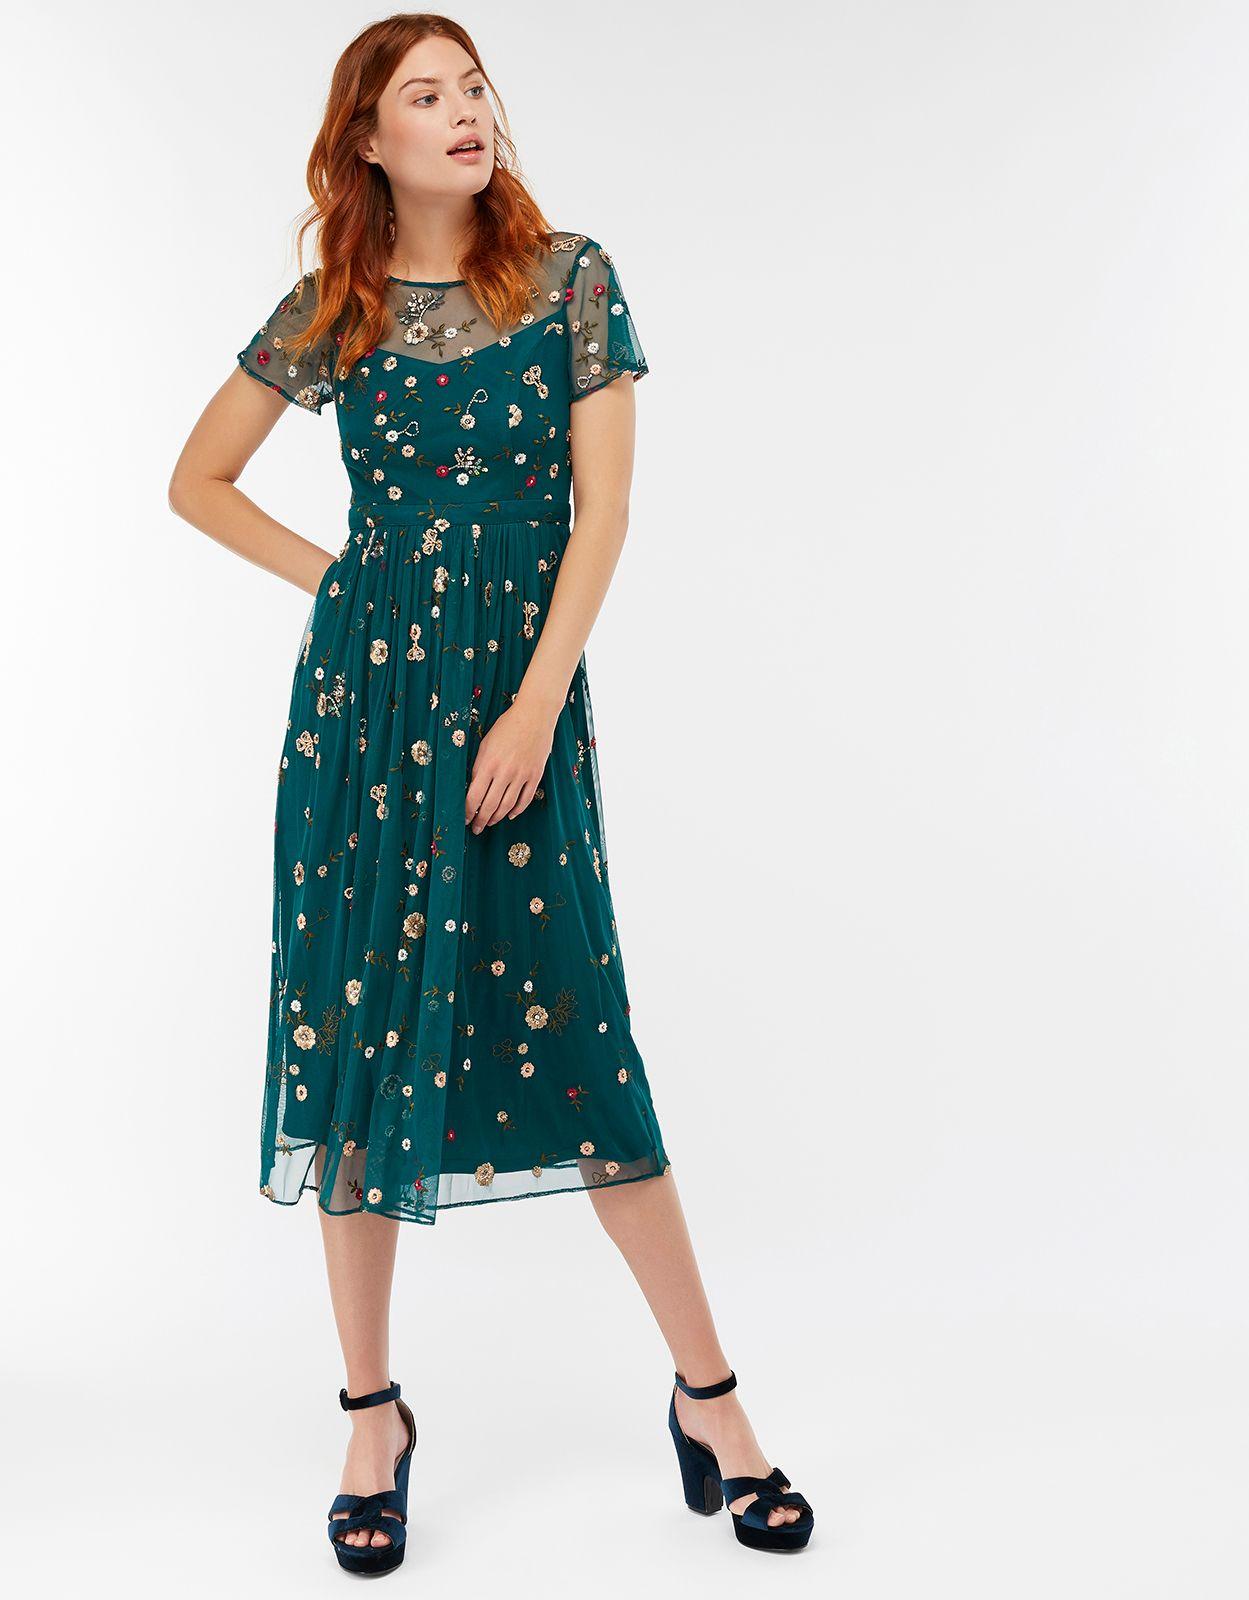 338dedab08 Forever 21 Plus Size Dresses Uk - Gomes Weine AG